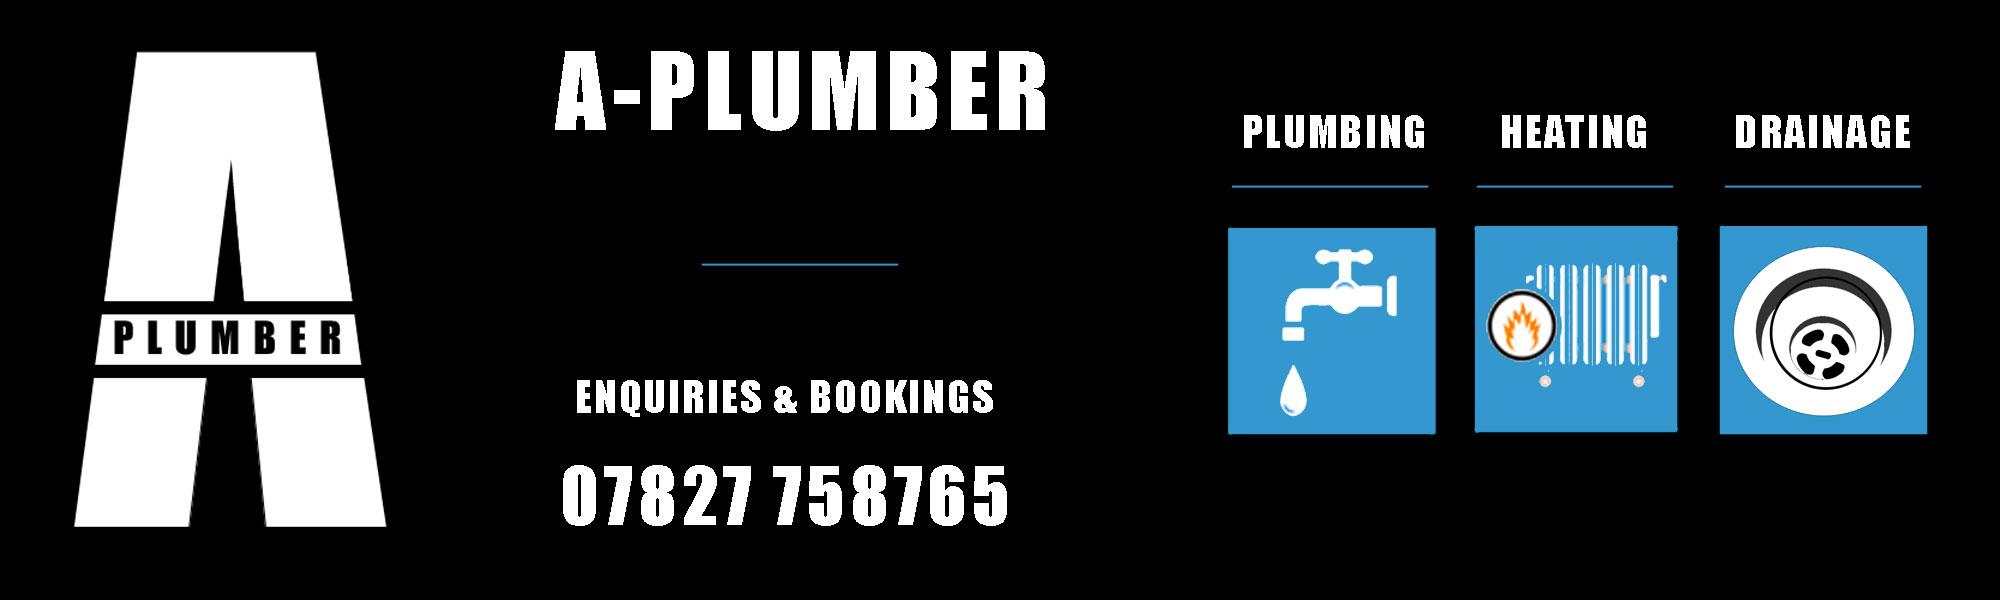 a plumber in Maidenhead header